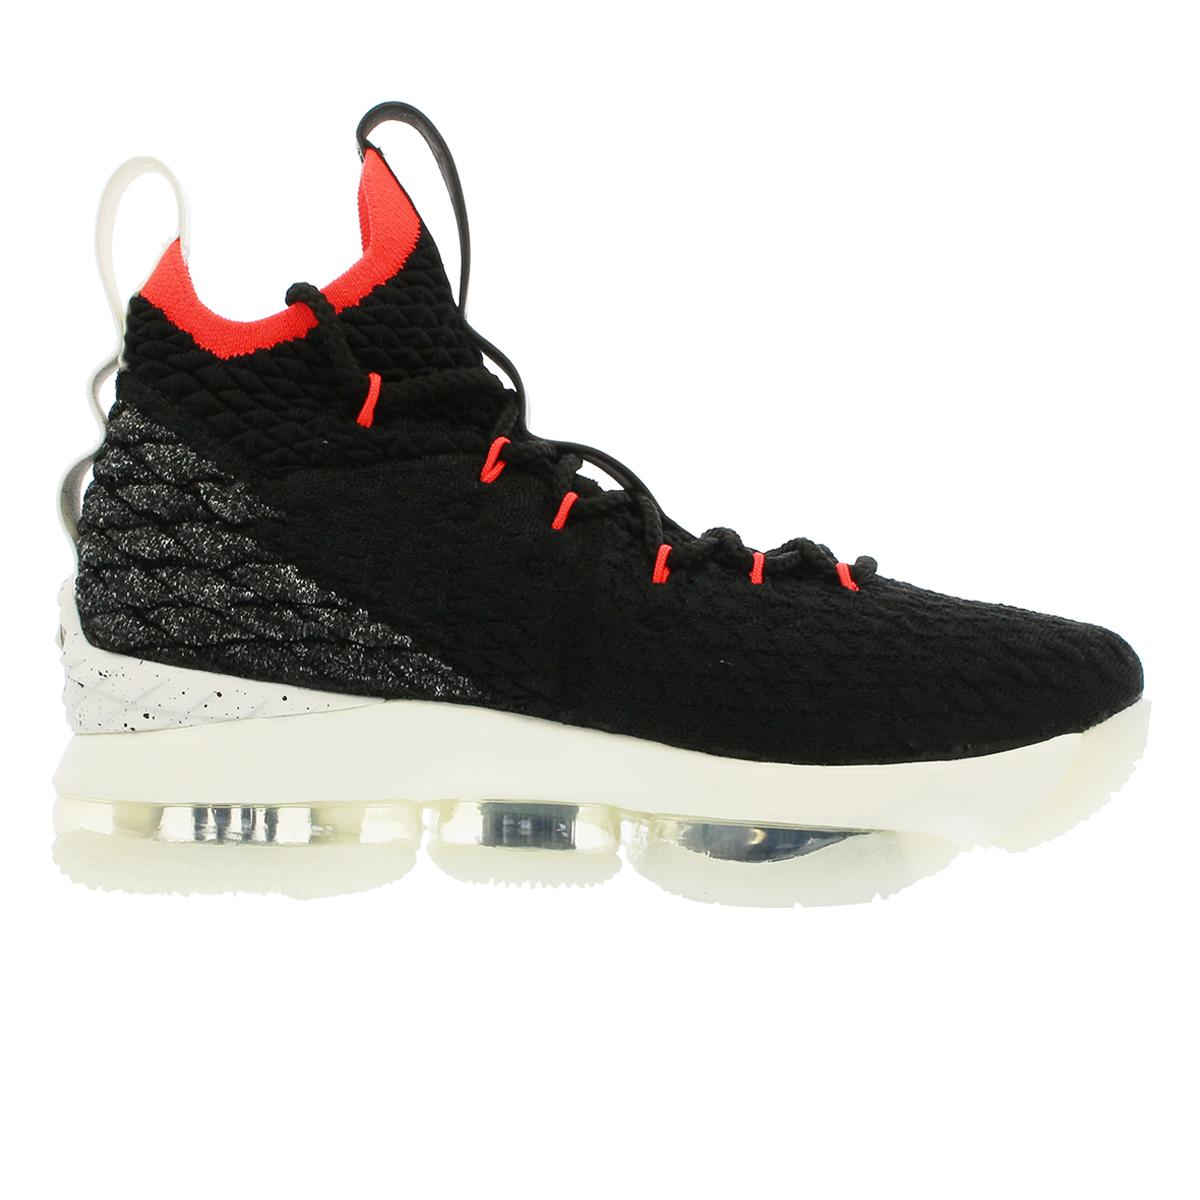 pretty nice a1ea4 6e2f6 ... NIKE LEBRON 15 GS Nike Revlon 15 GS BLACK SAIL BRIGHT CRIMSON aq6176-  ...